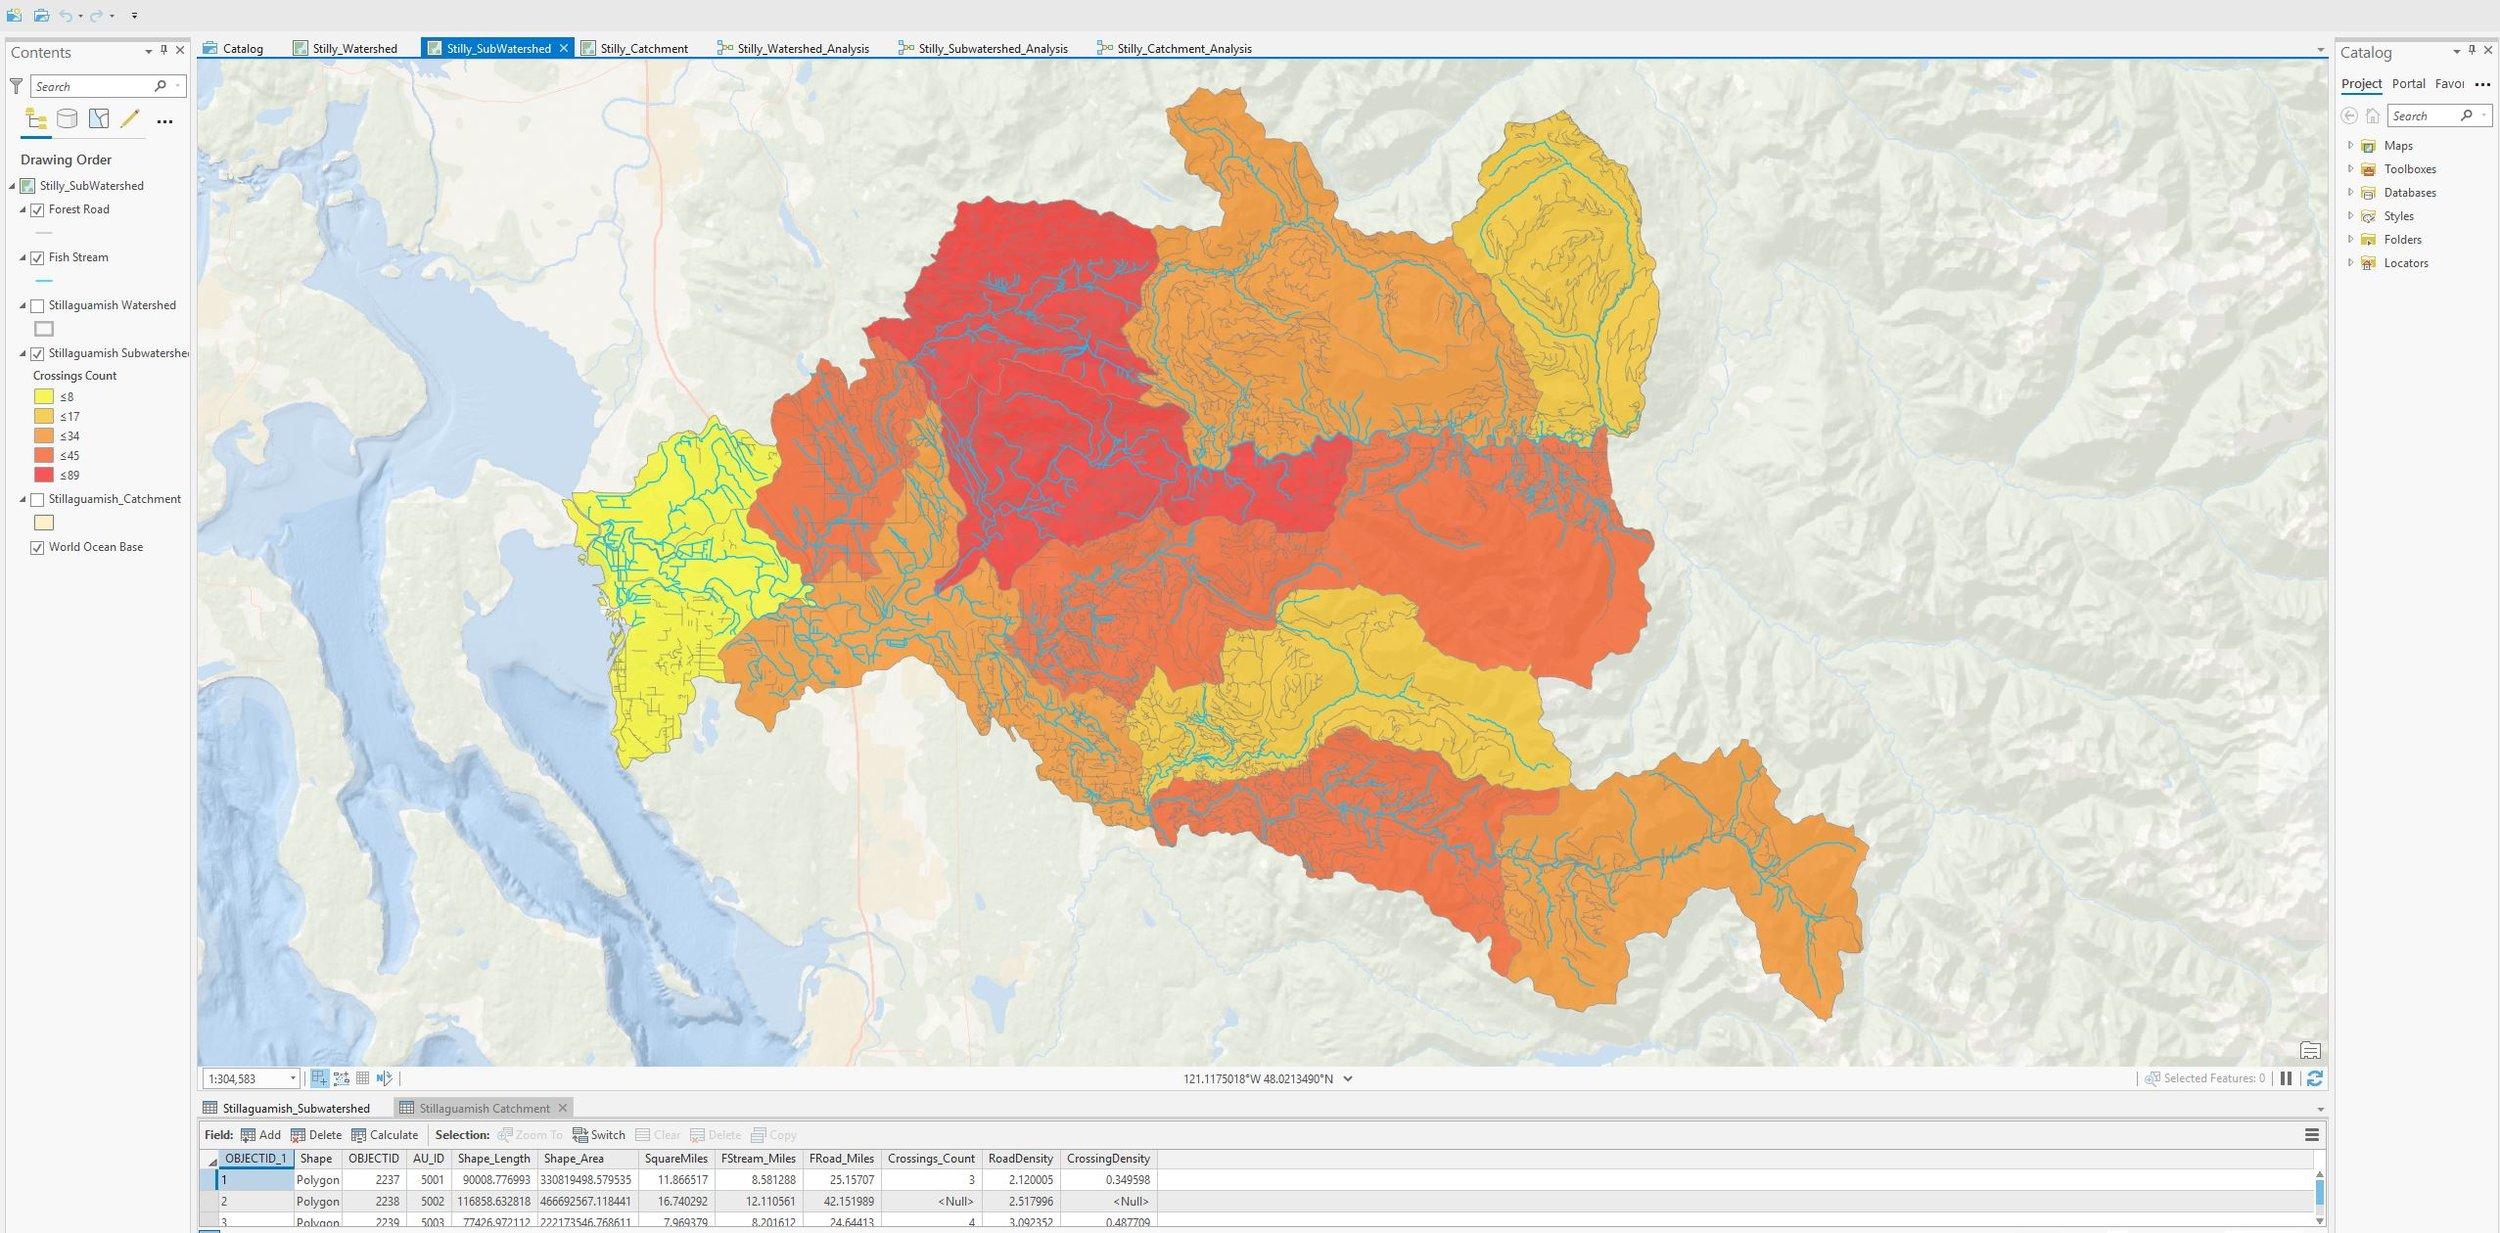 Hitchner_ENVS421_Lab4_Stillaguamish_Subwatershed_Map.JPG